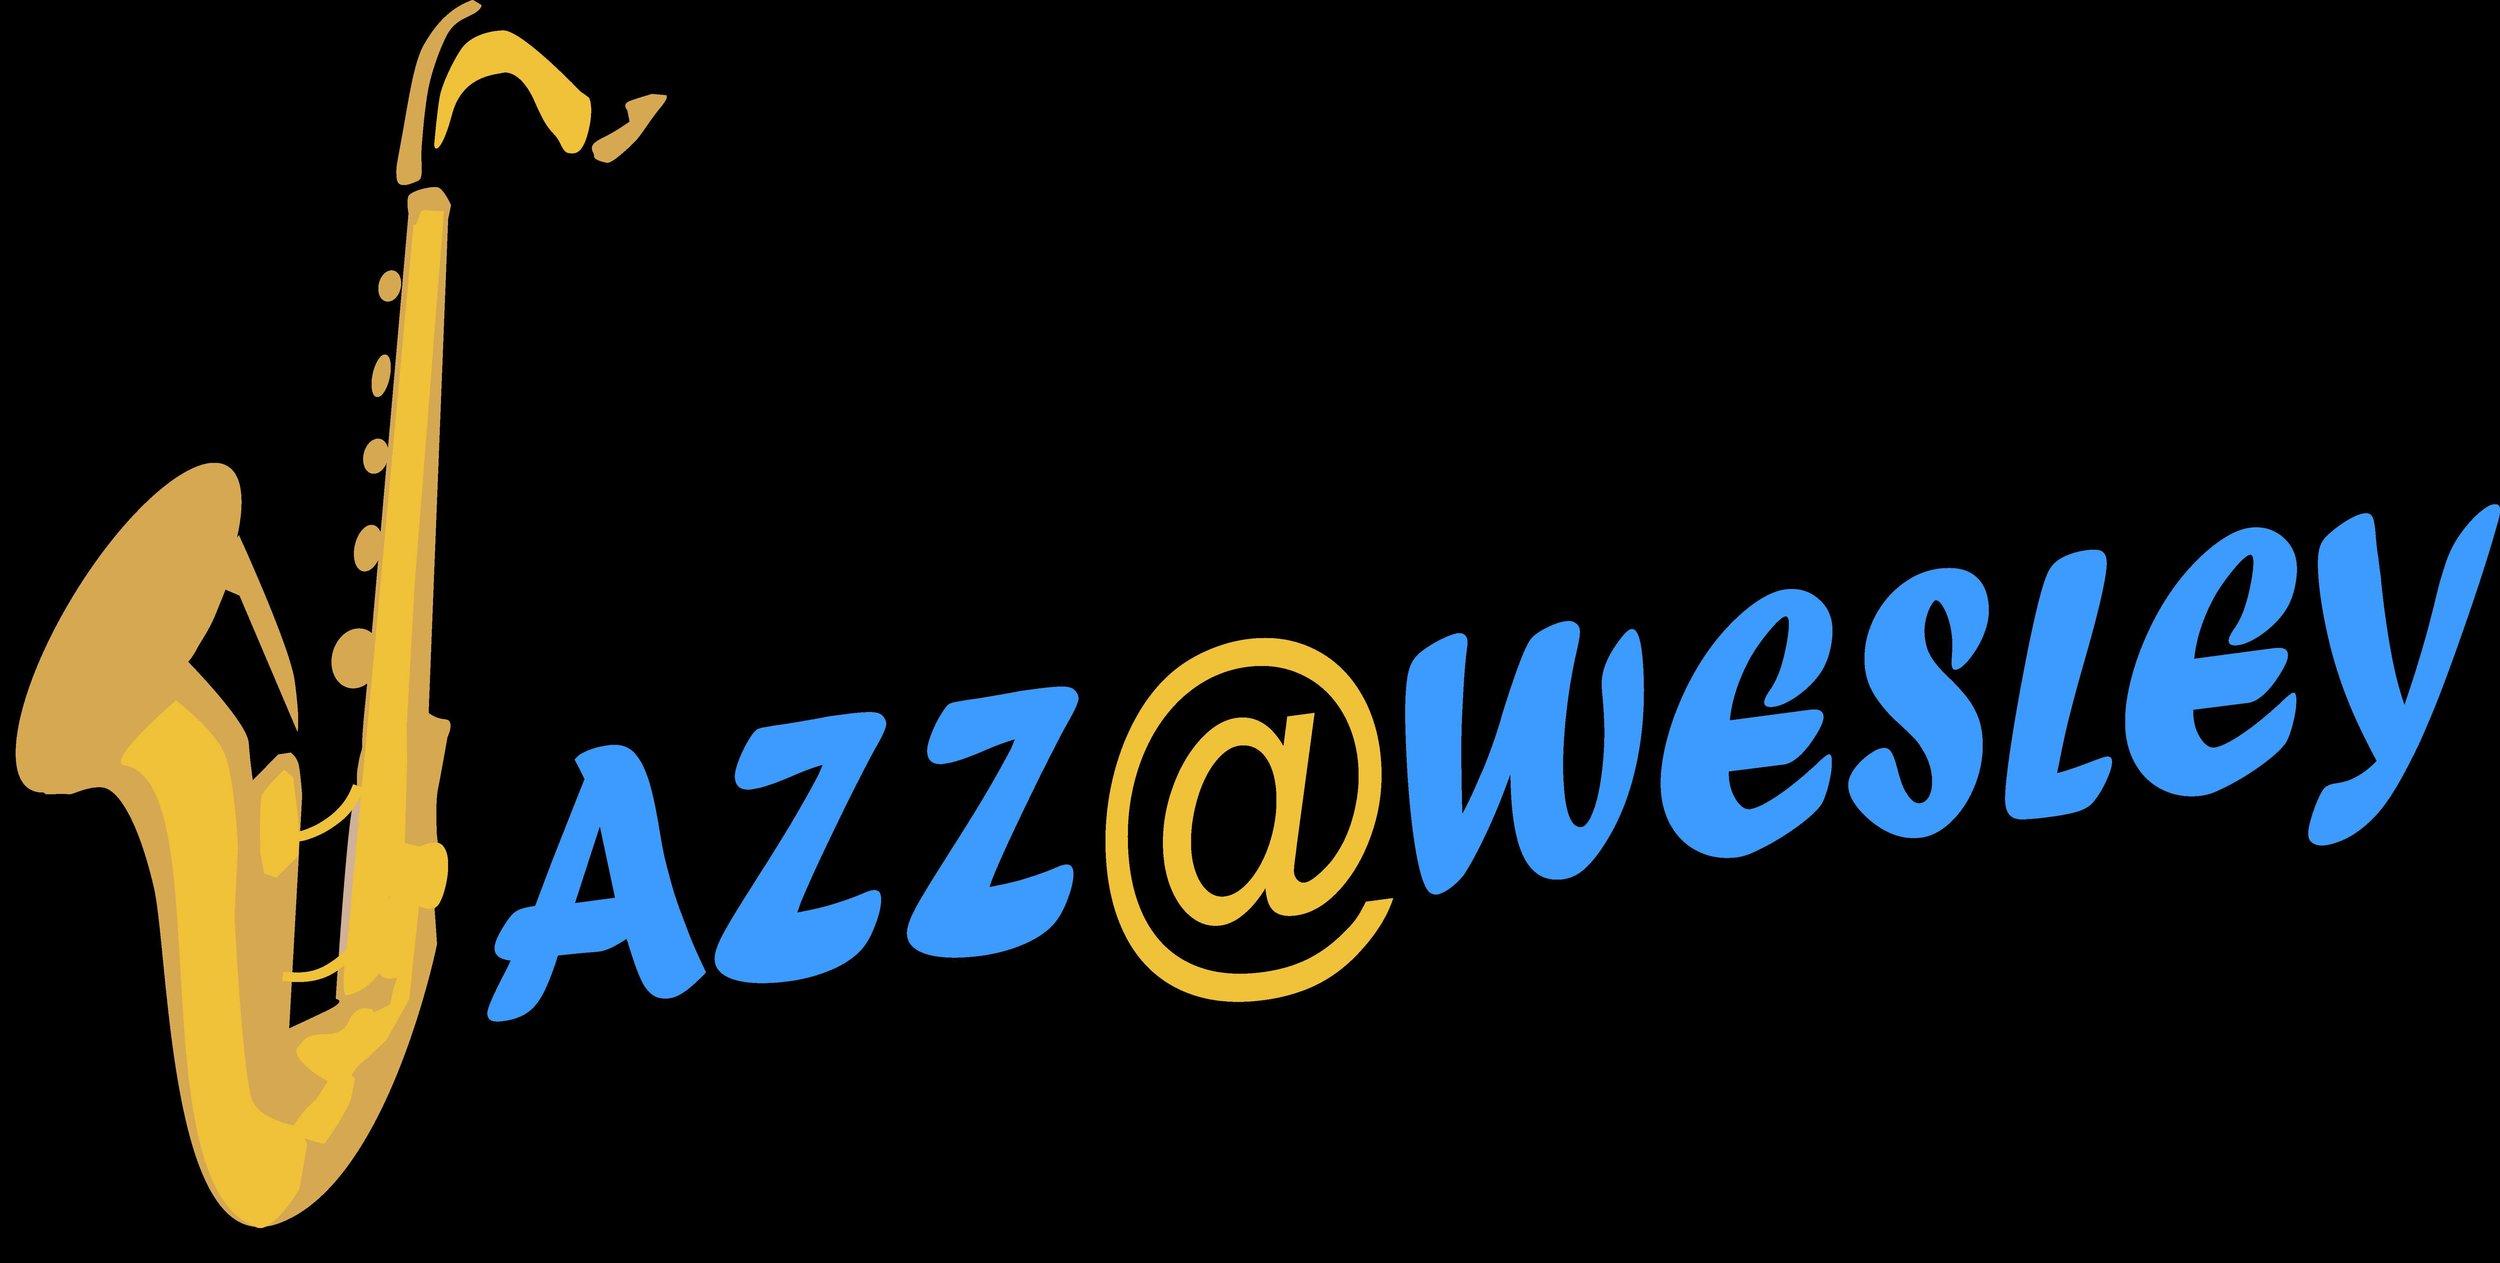 Jazz_Wesley_logo.jpg